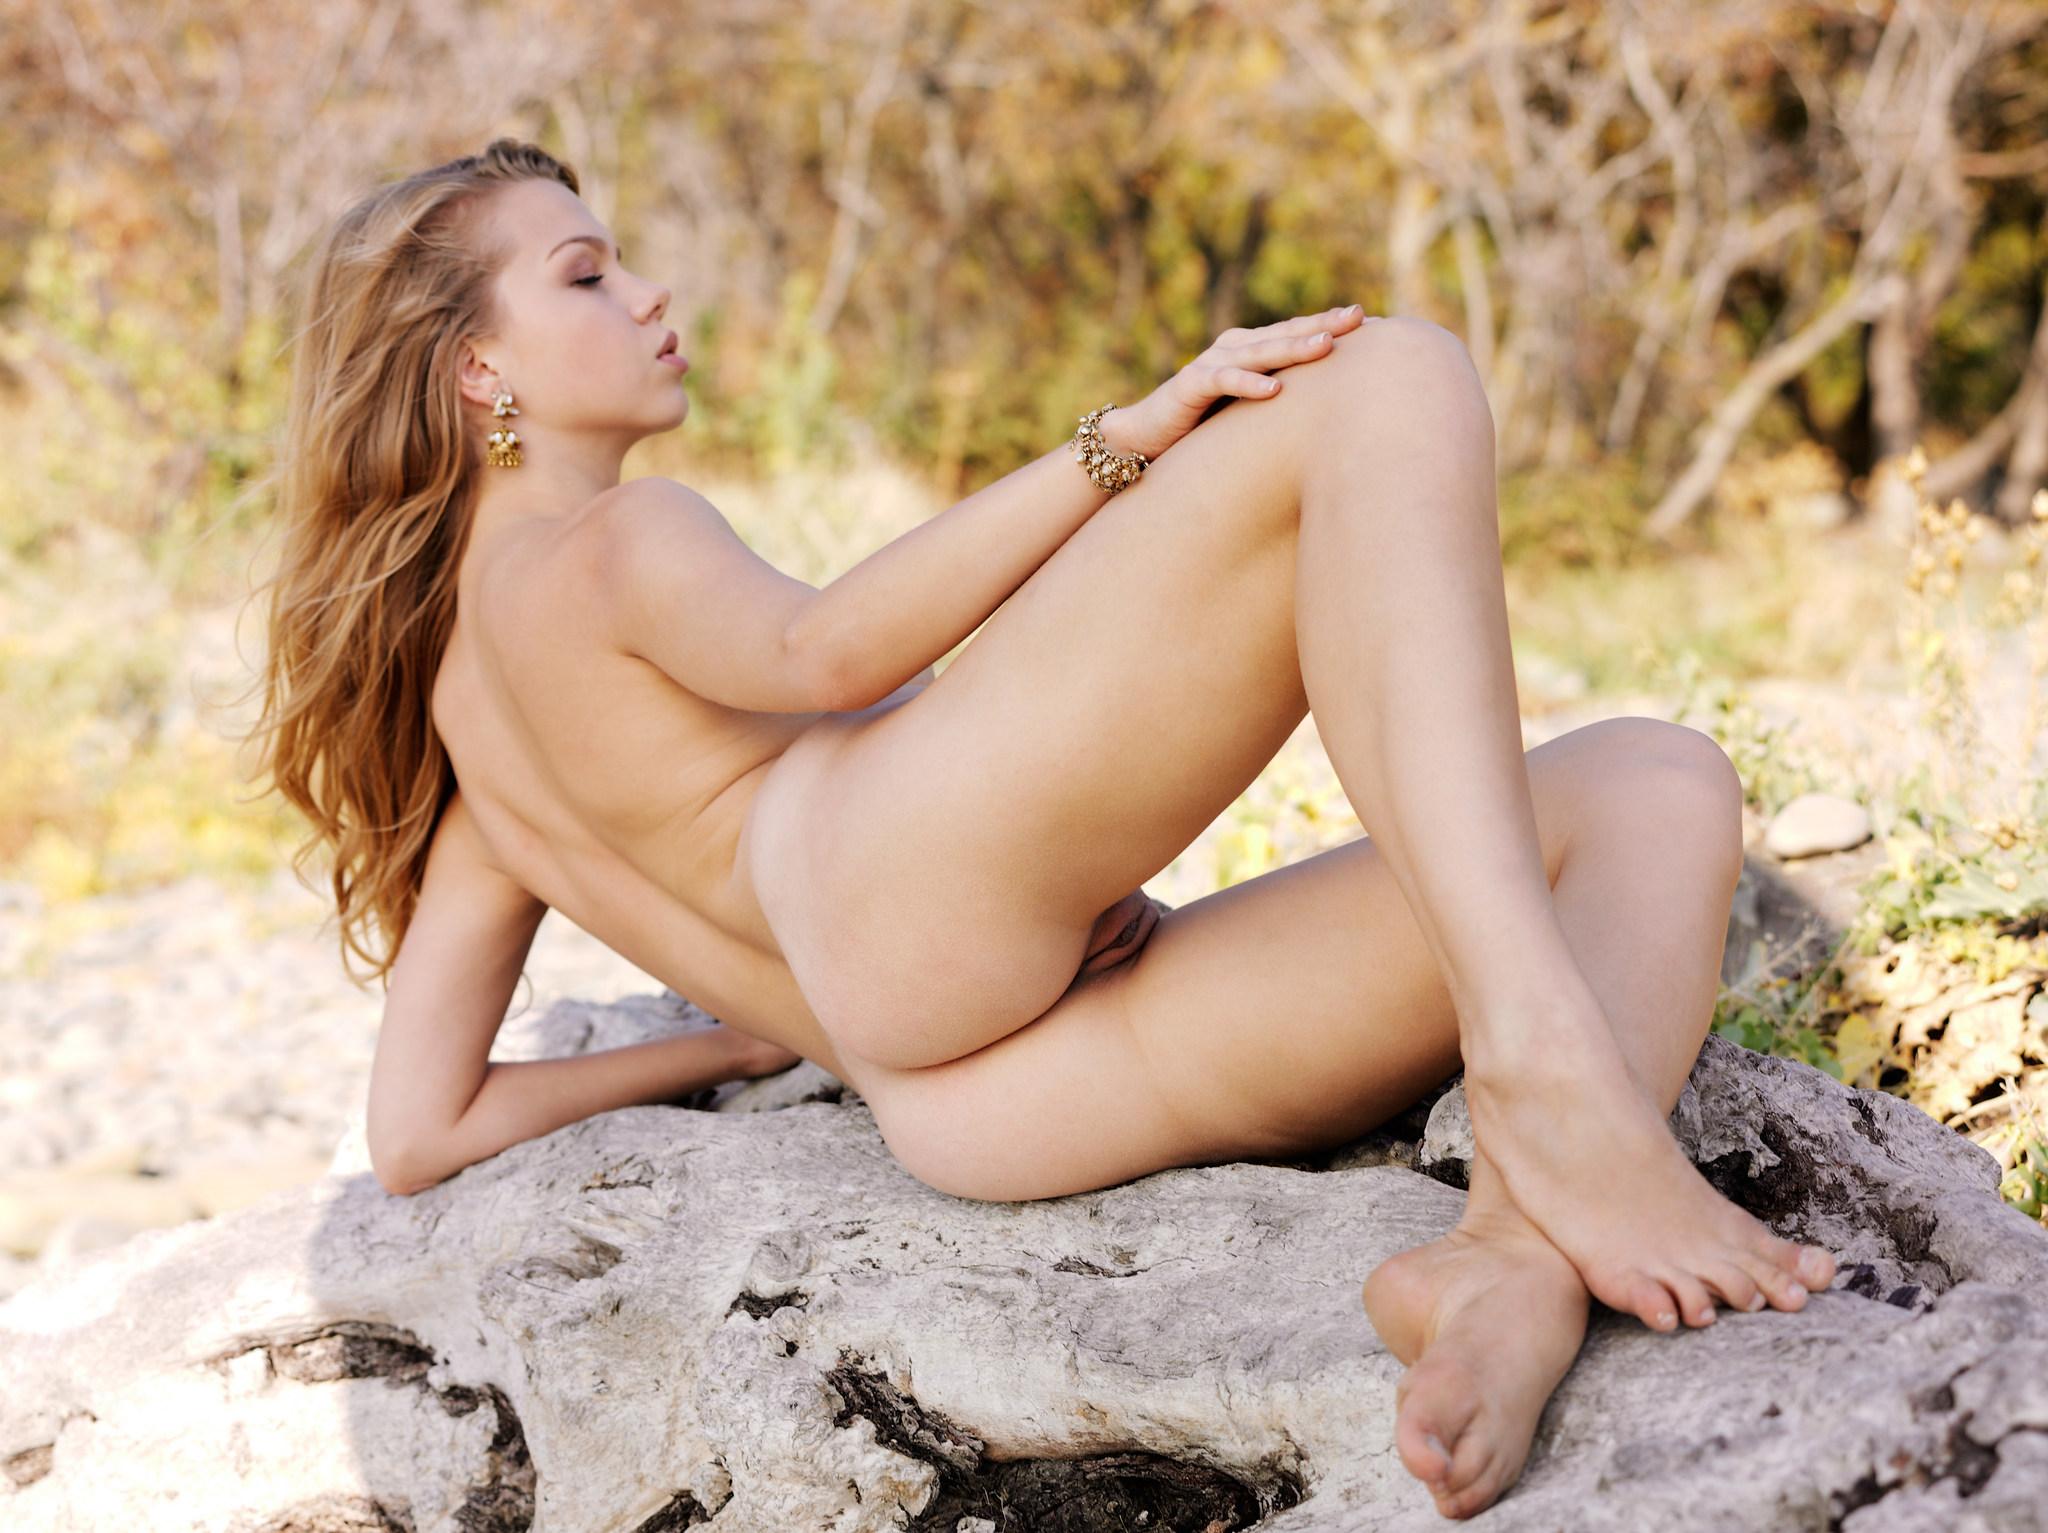 Amelia Heinle Nude amelia porn pic - eporner